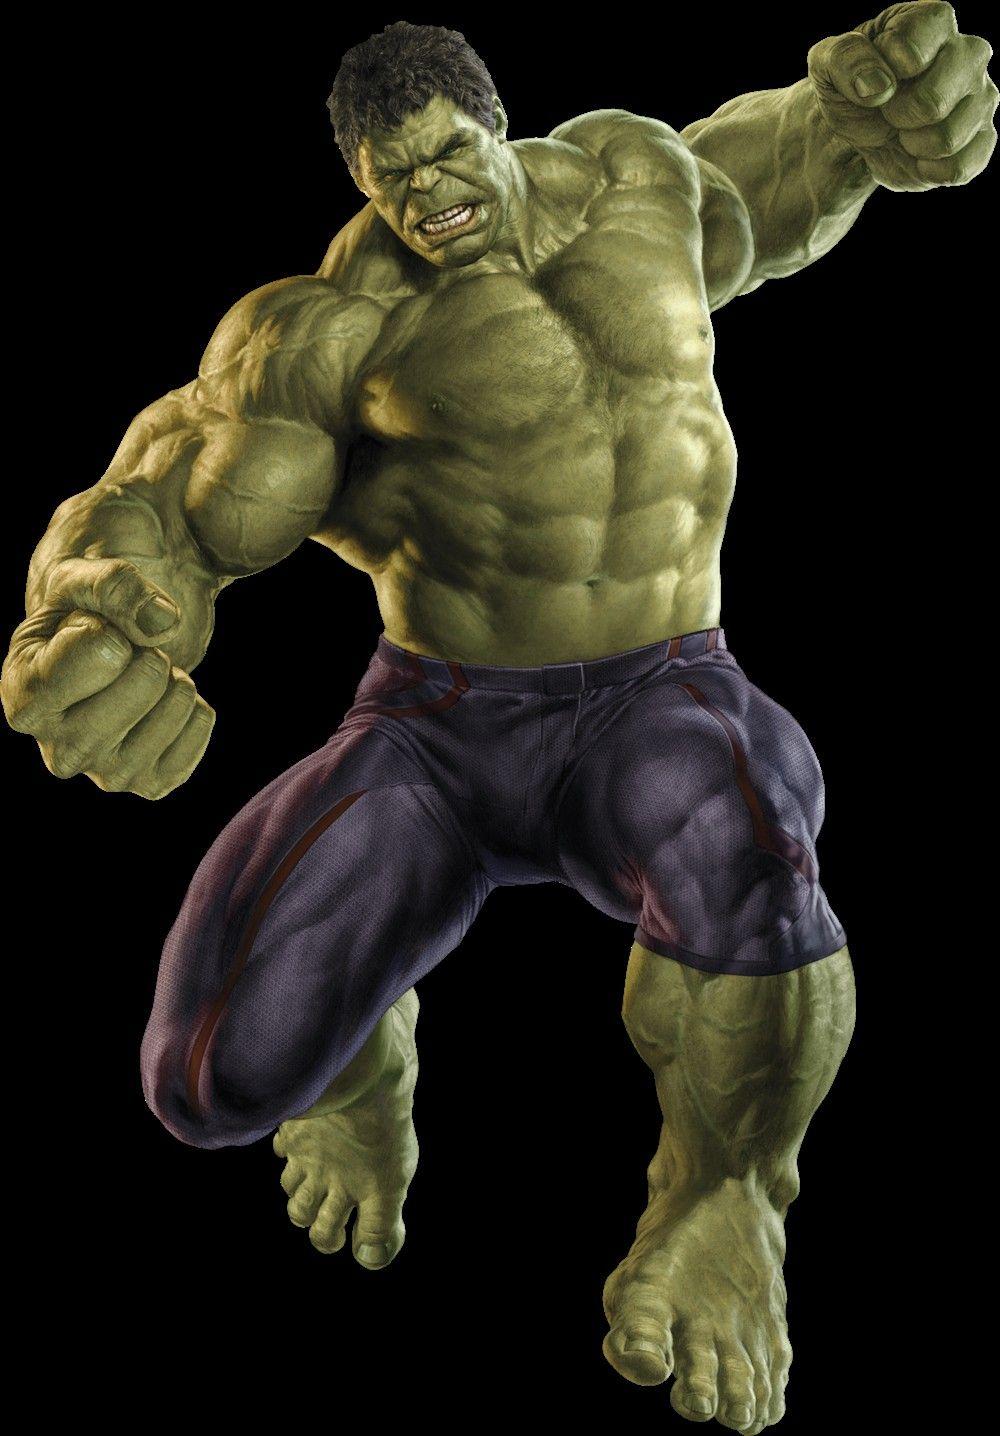 Hulk #Clip #Art. (Hulk Black Background) (THE * 5 * STÅR * ÅWARD ...